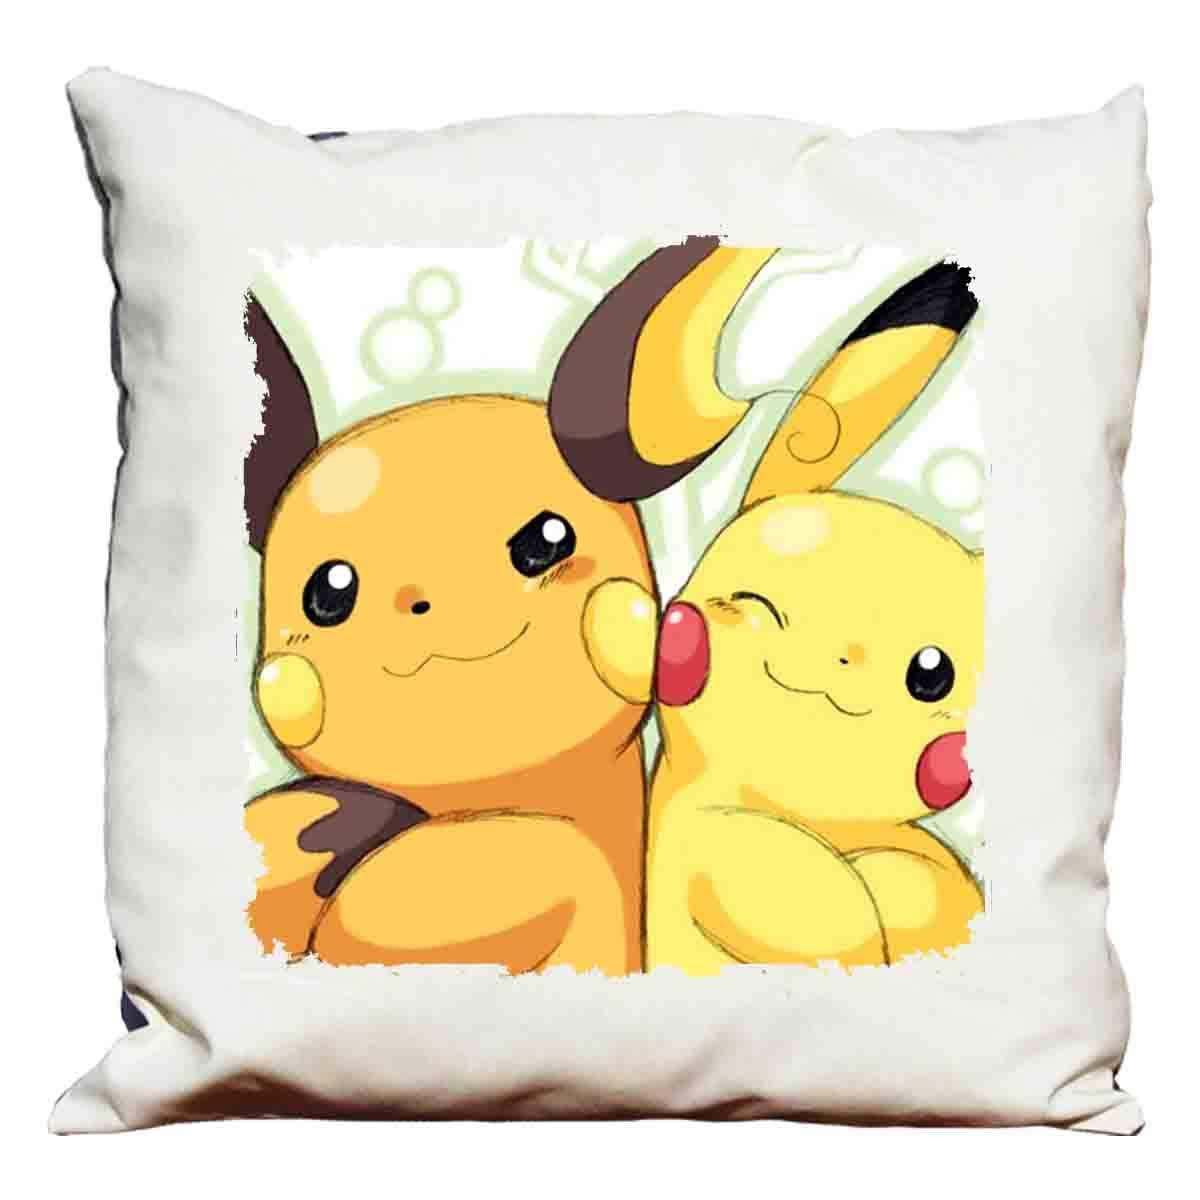 cojín decorativo Pokemon Pikachu: Amazon.es: Hogar